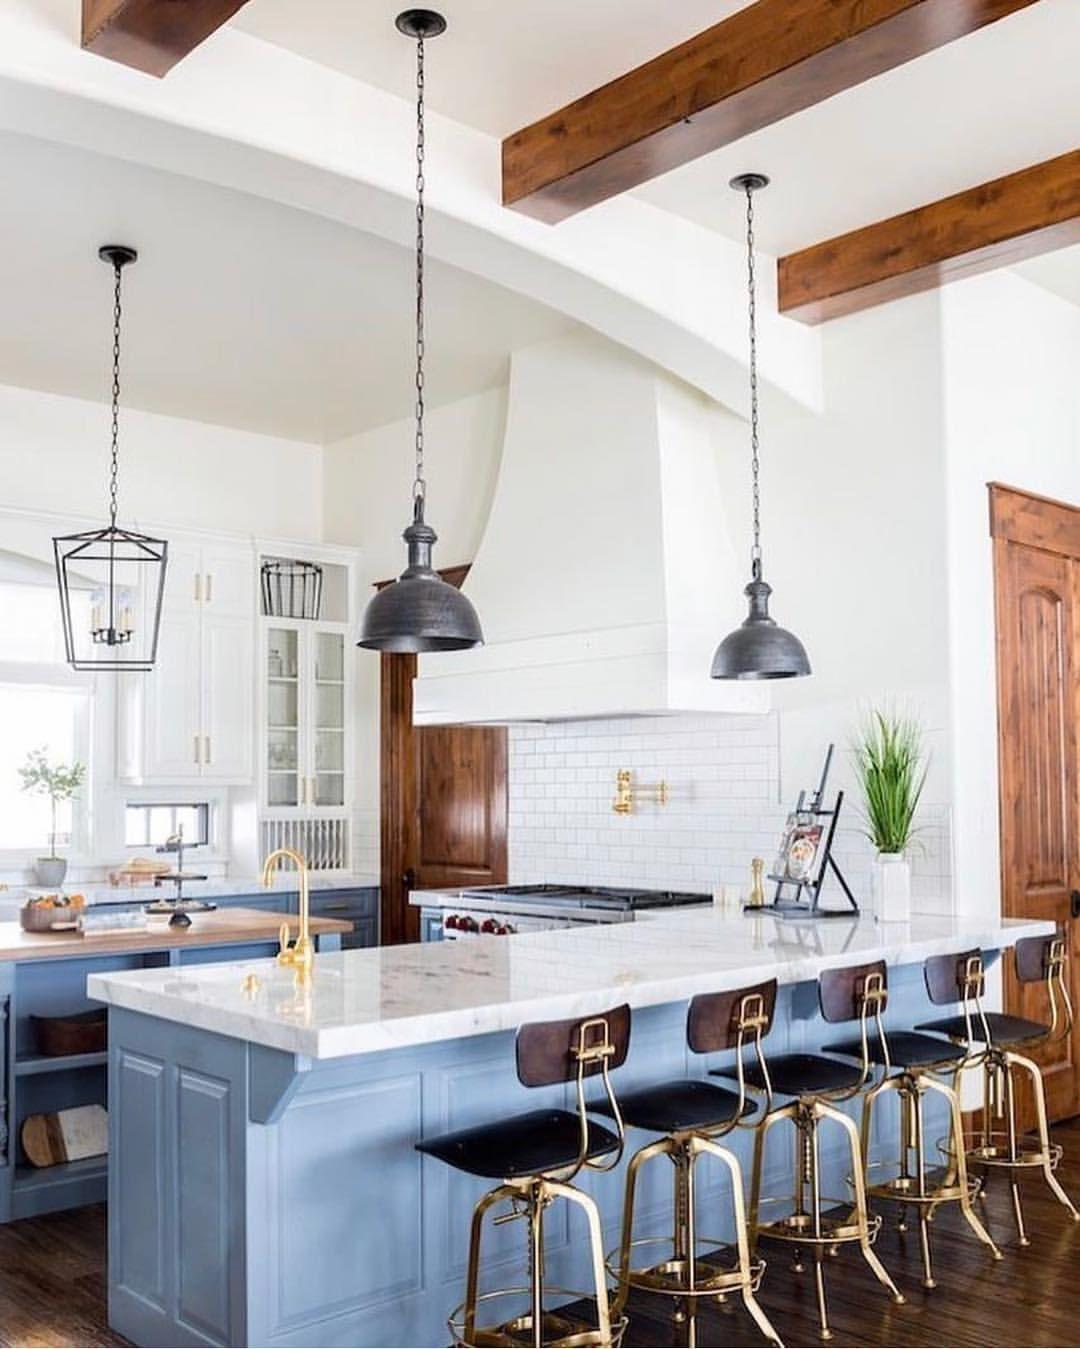 Kitchen with cool stools Rental Pinterest Stools Kitchen